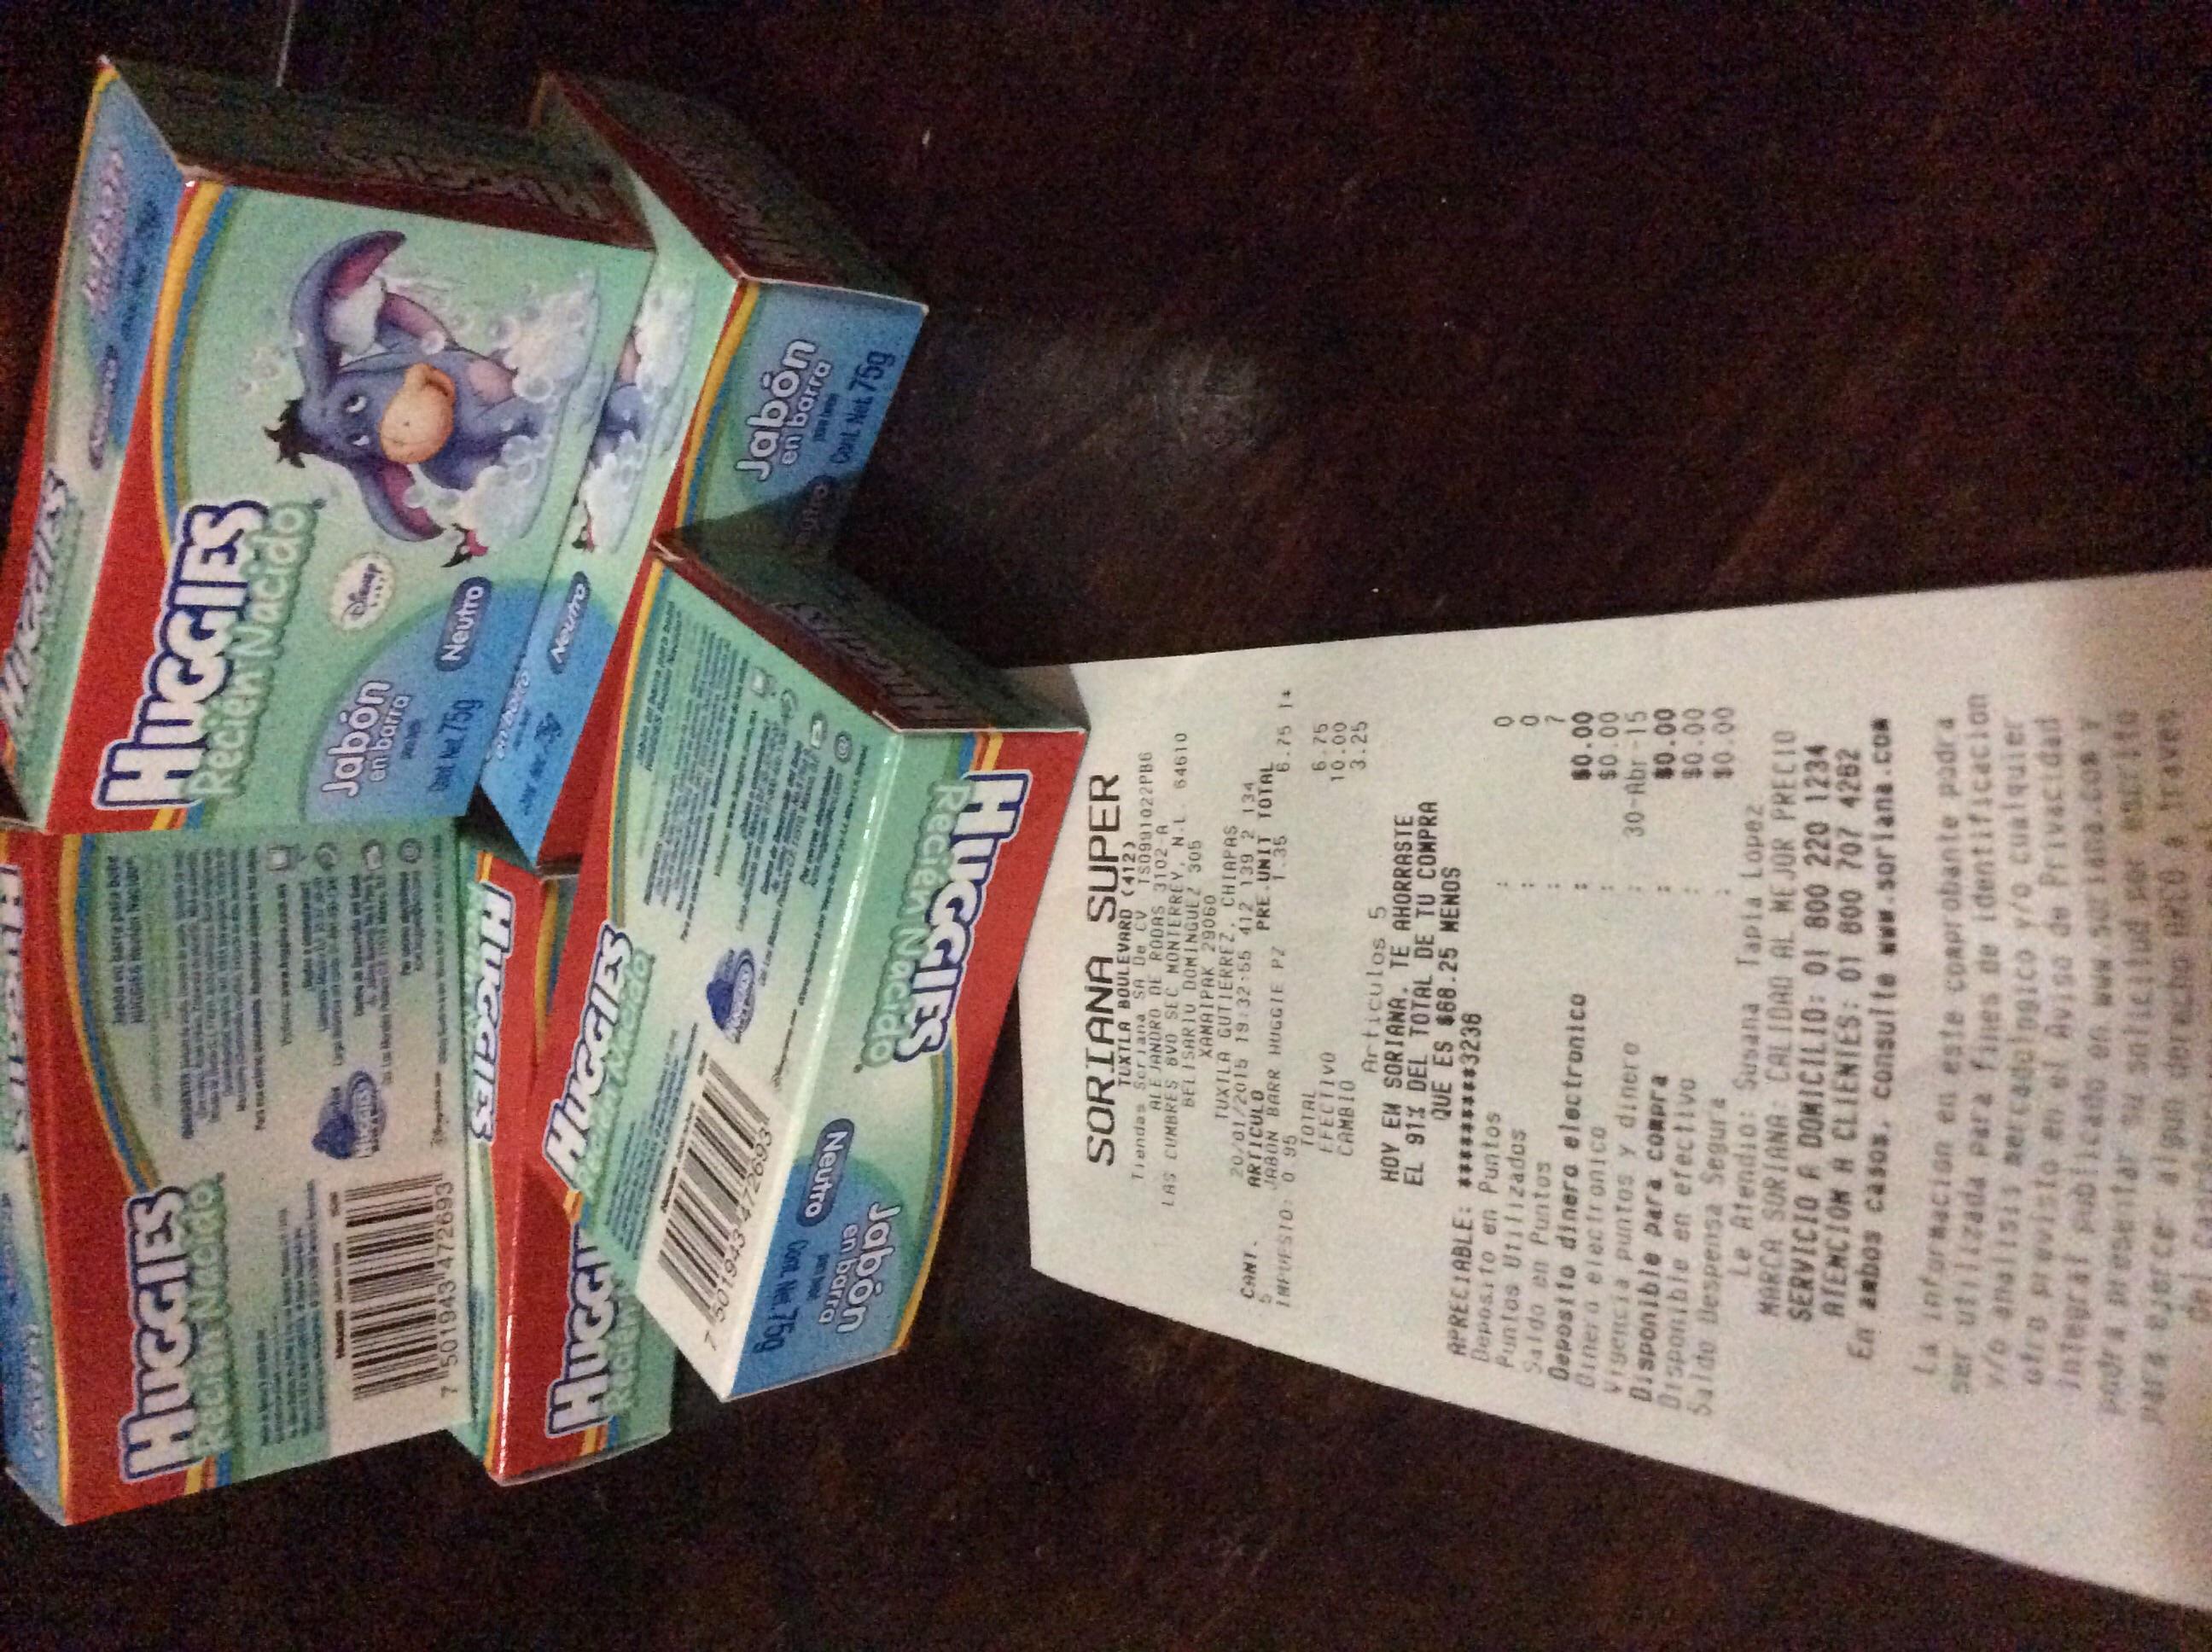 Soriana: Jabón Huggies Recién Nacido Neutro 75gr $1.35